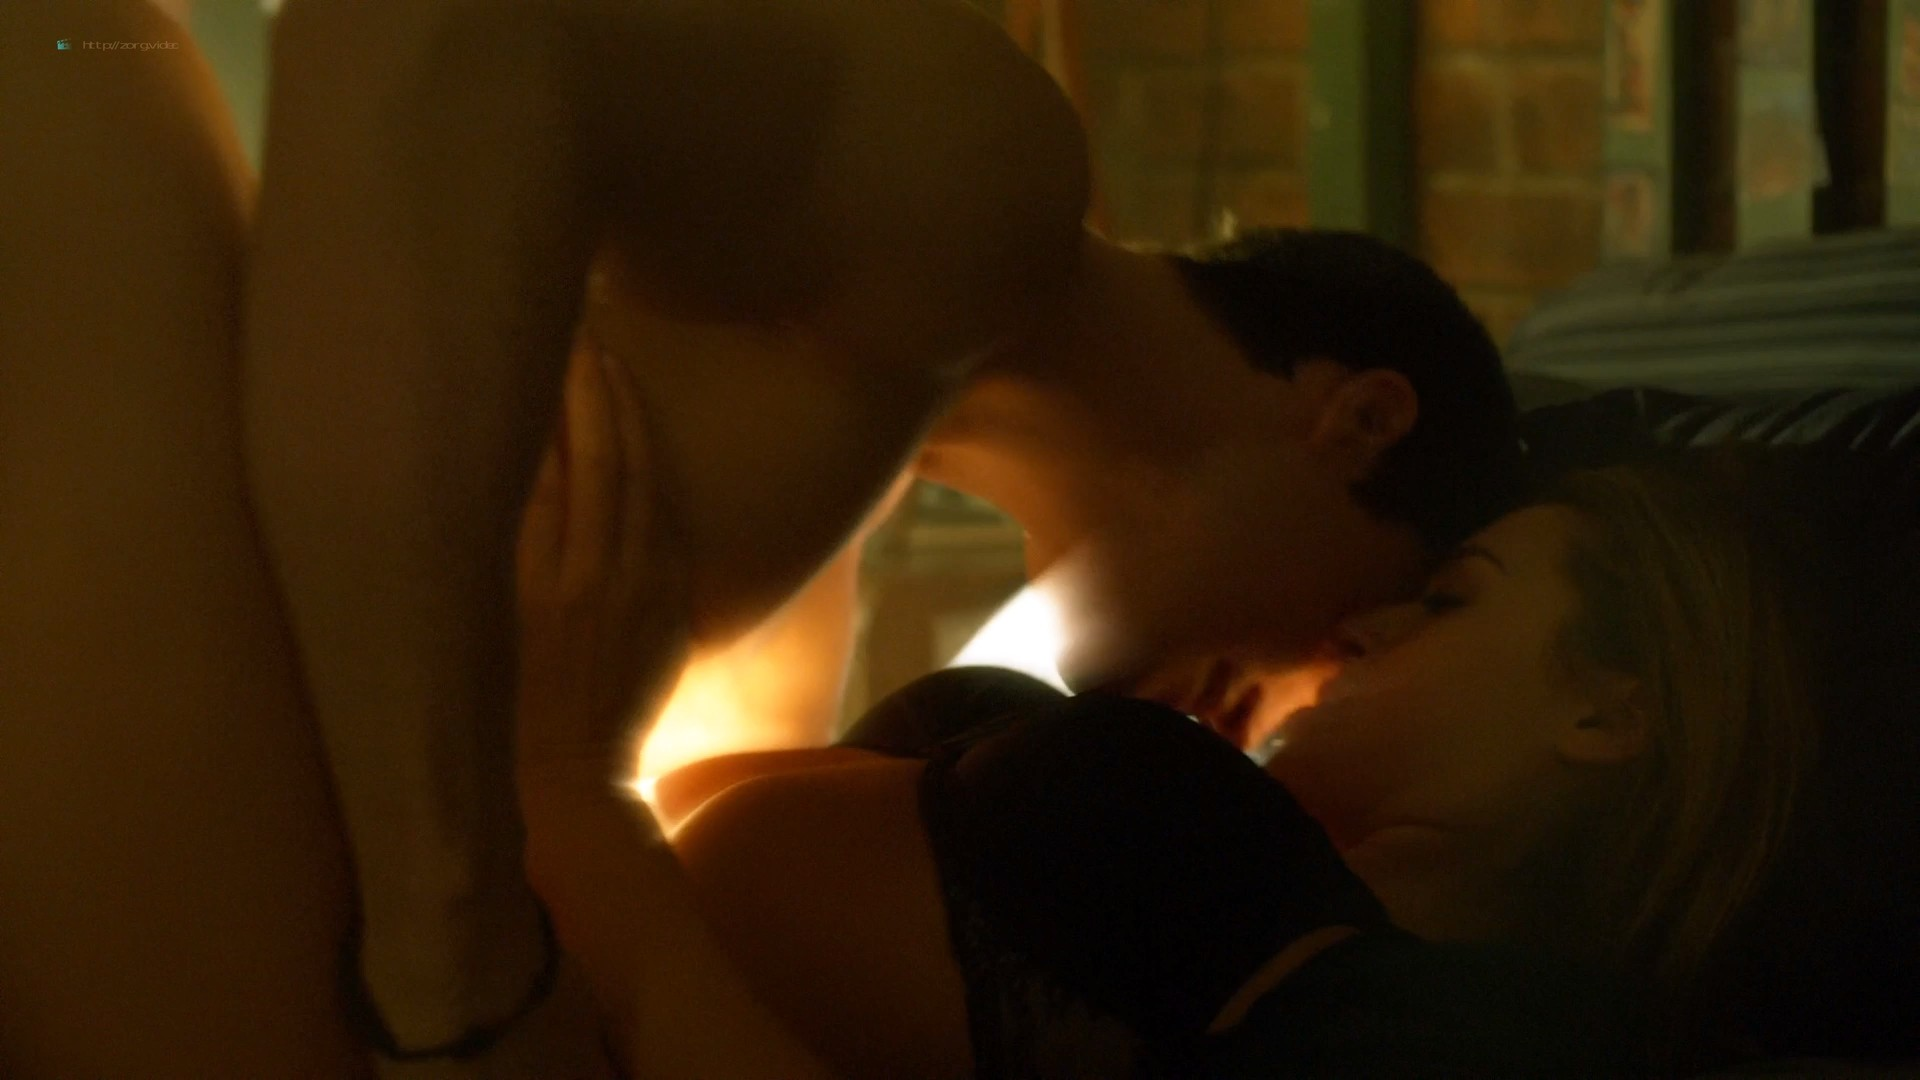 Alexa Vega hot and some sex - The Tomorrow People (2014) s1e18-19 HD (7)